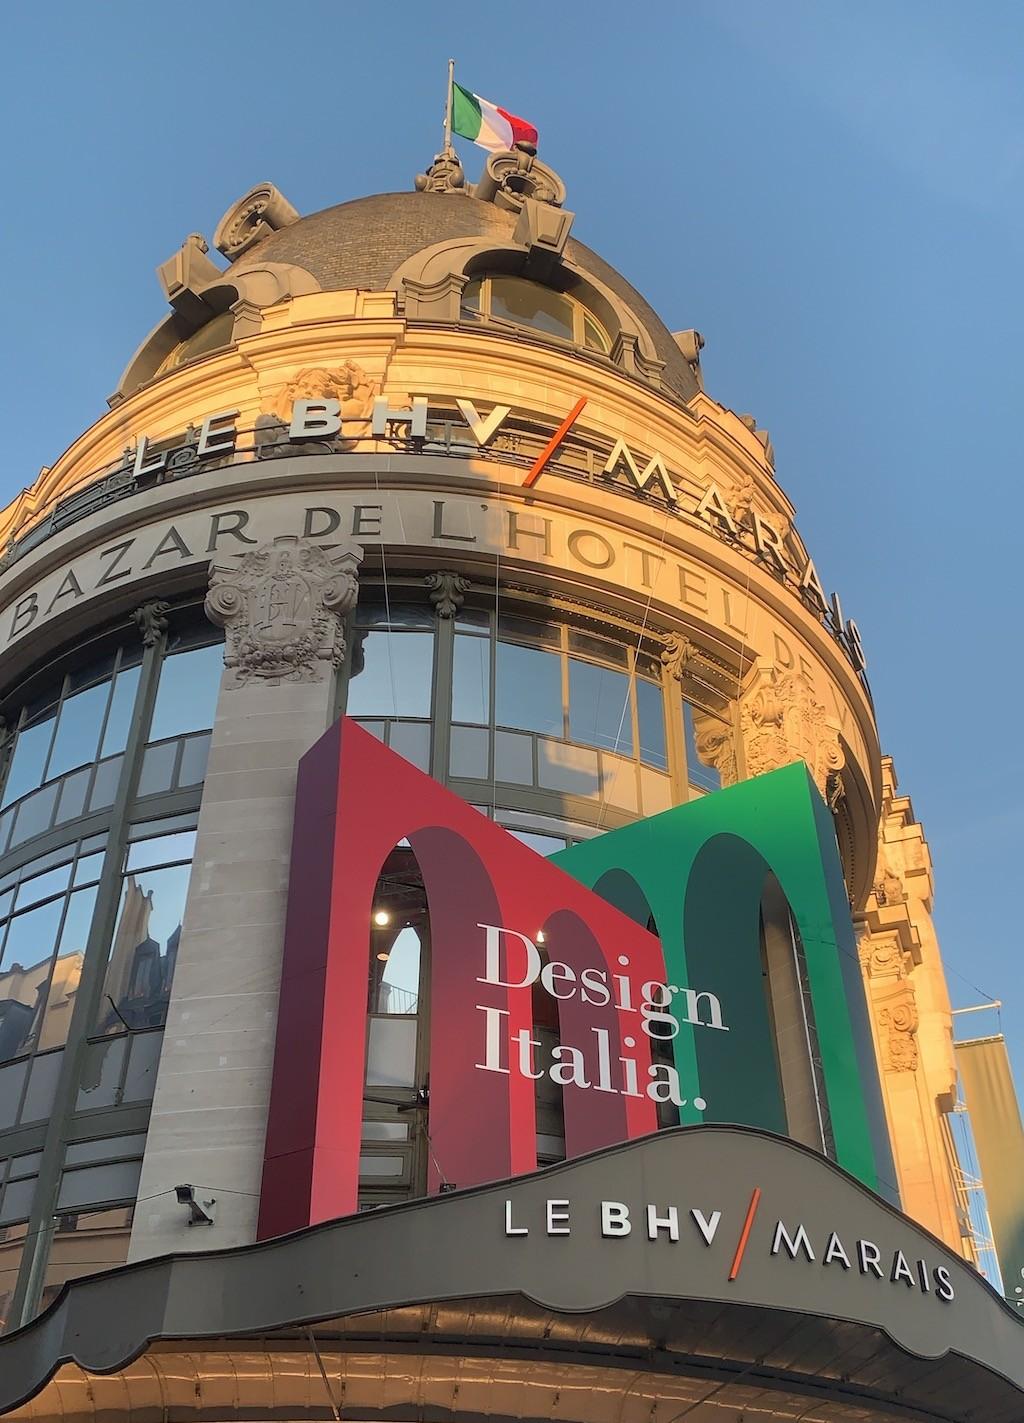 Le BHV / Marais Fassade. Design Bestseller in Paris